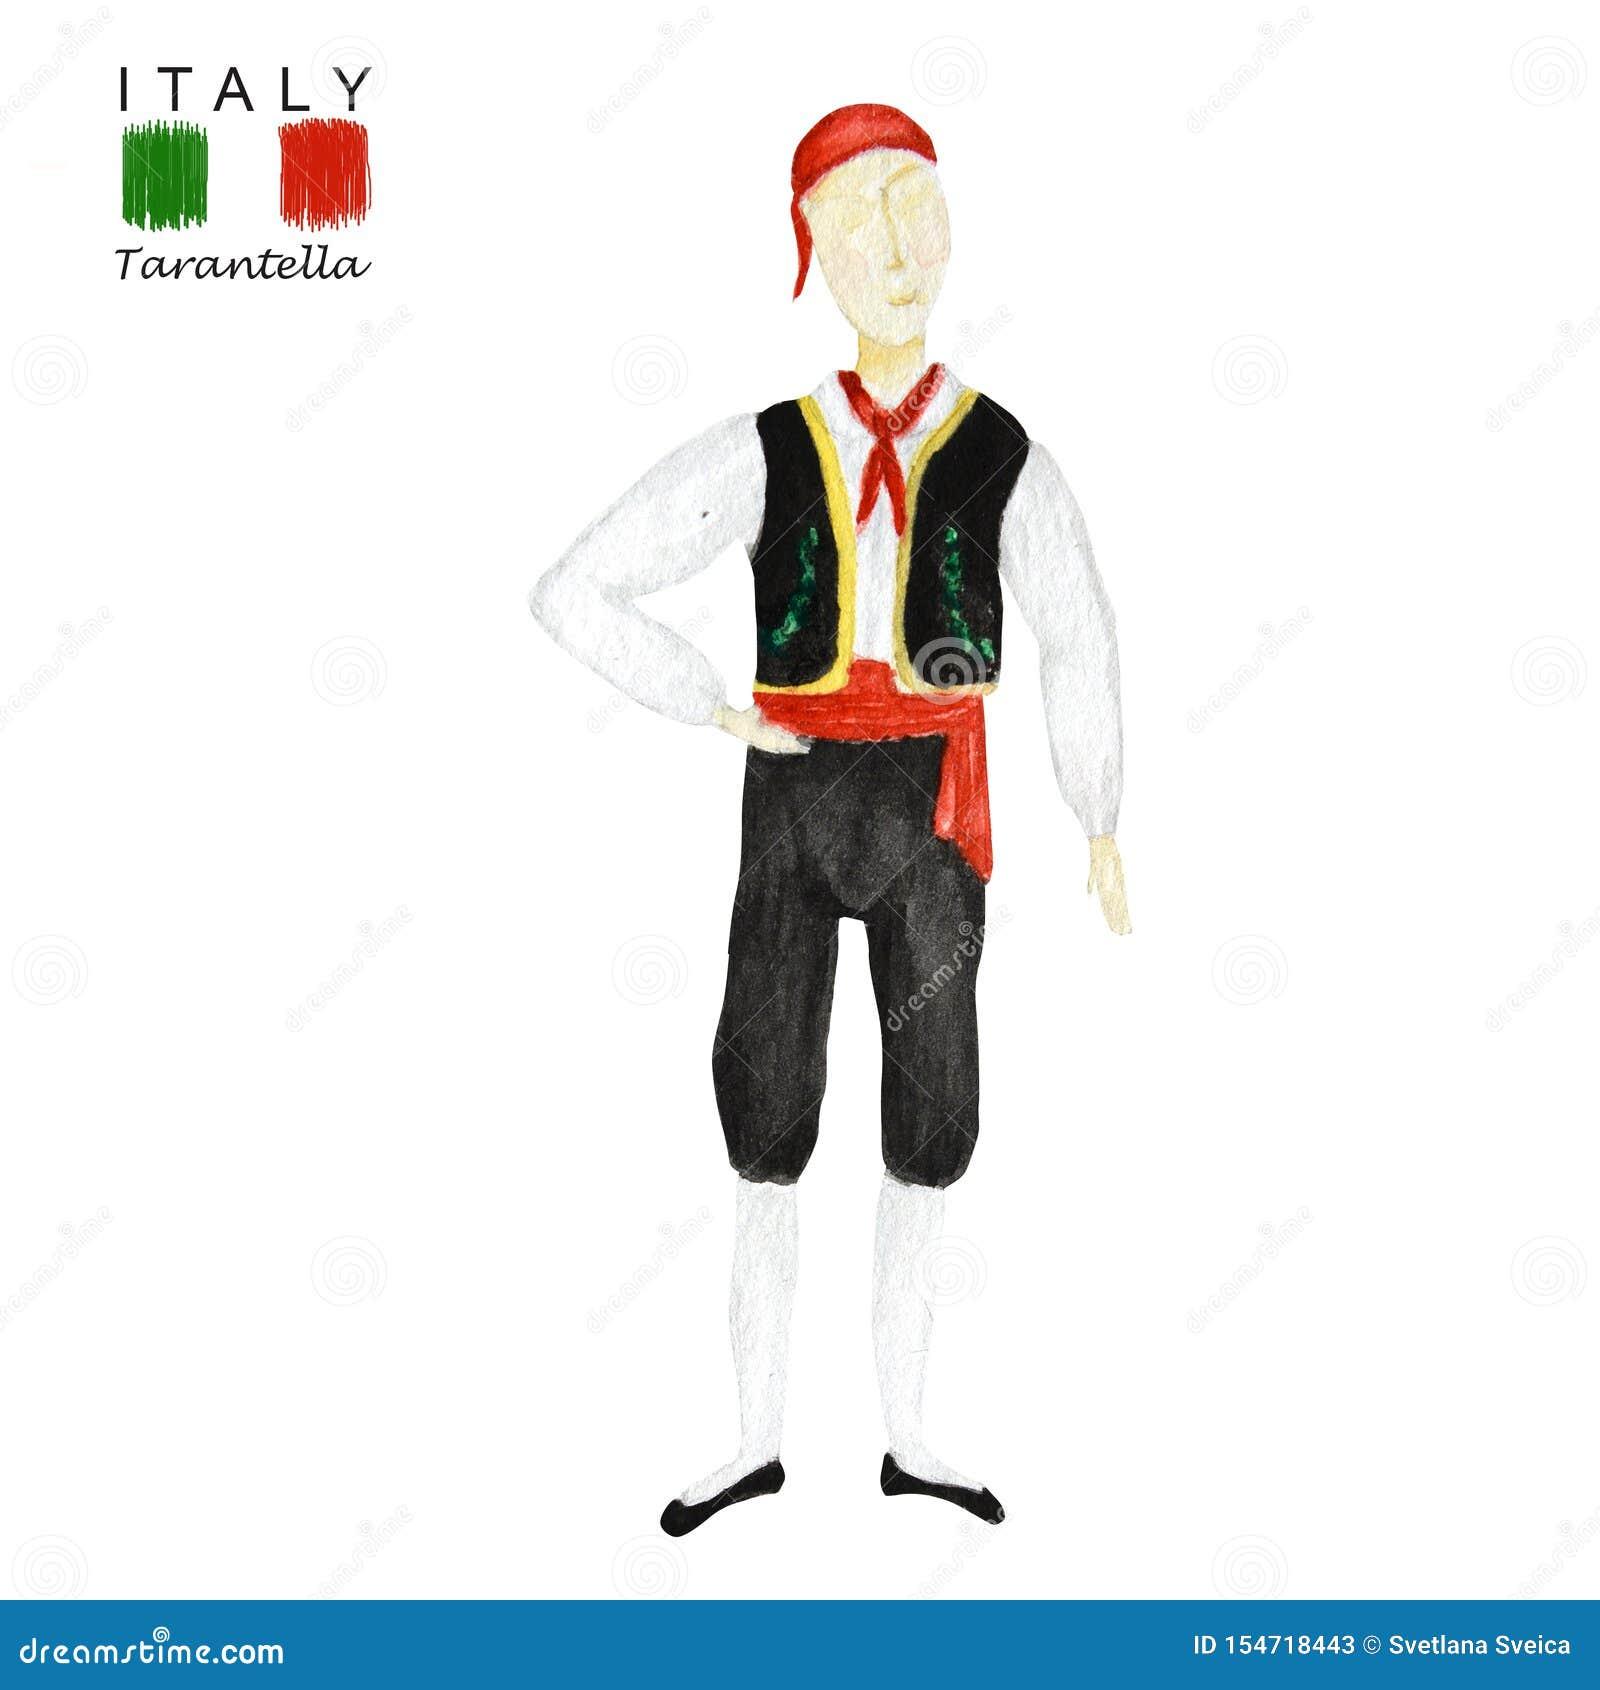 National Costume Dancing An Italian Tarantella On White